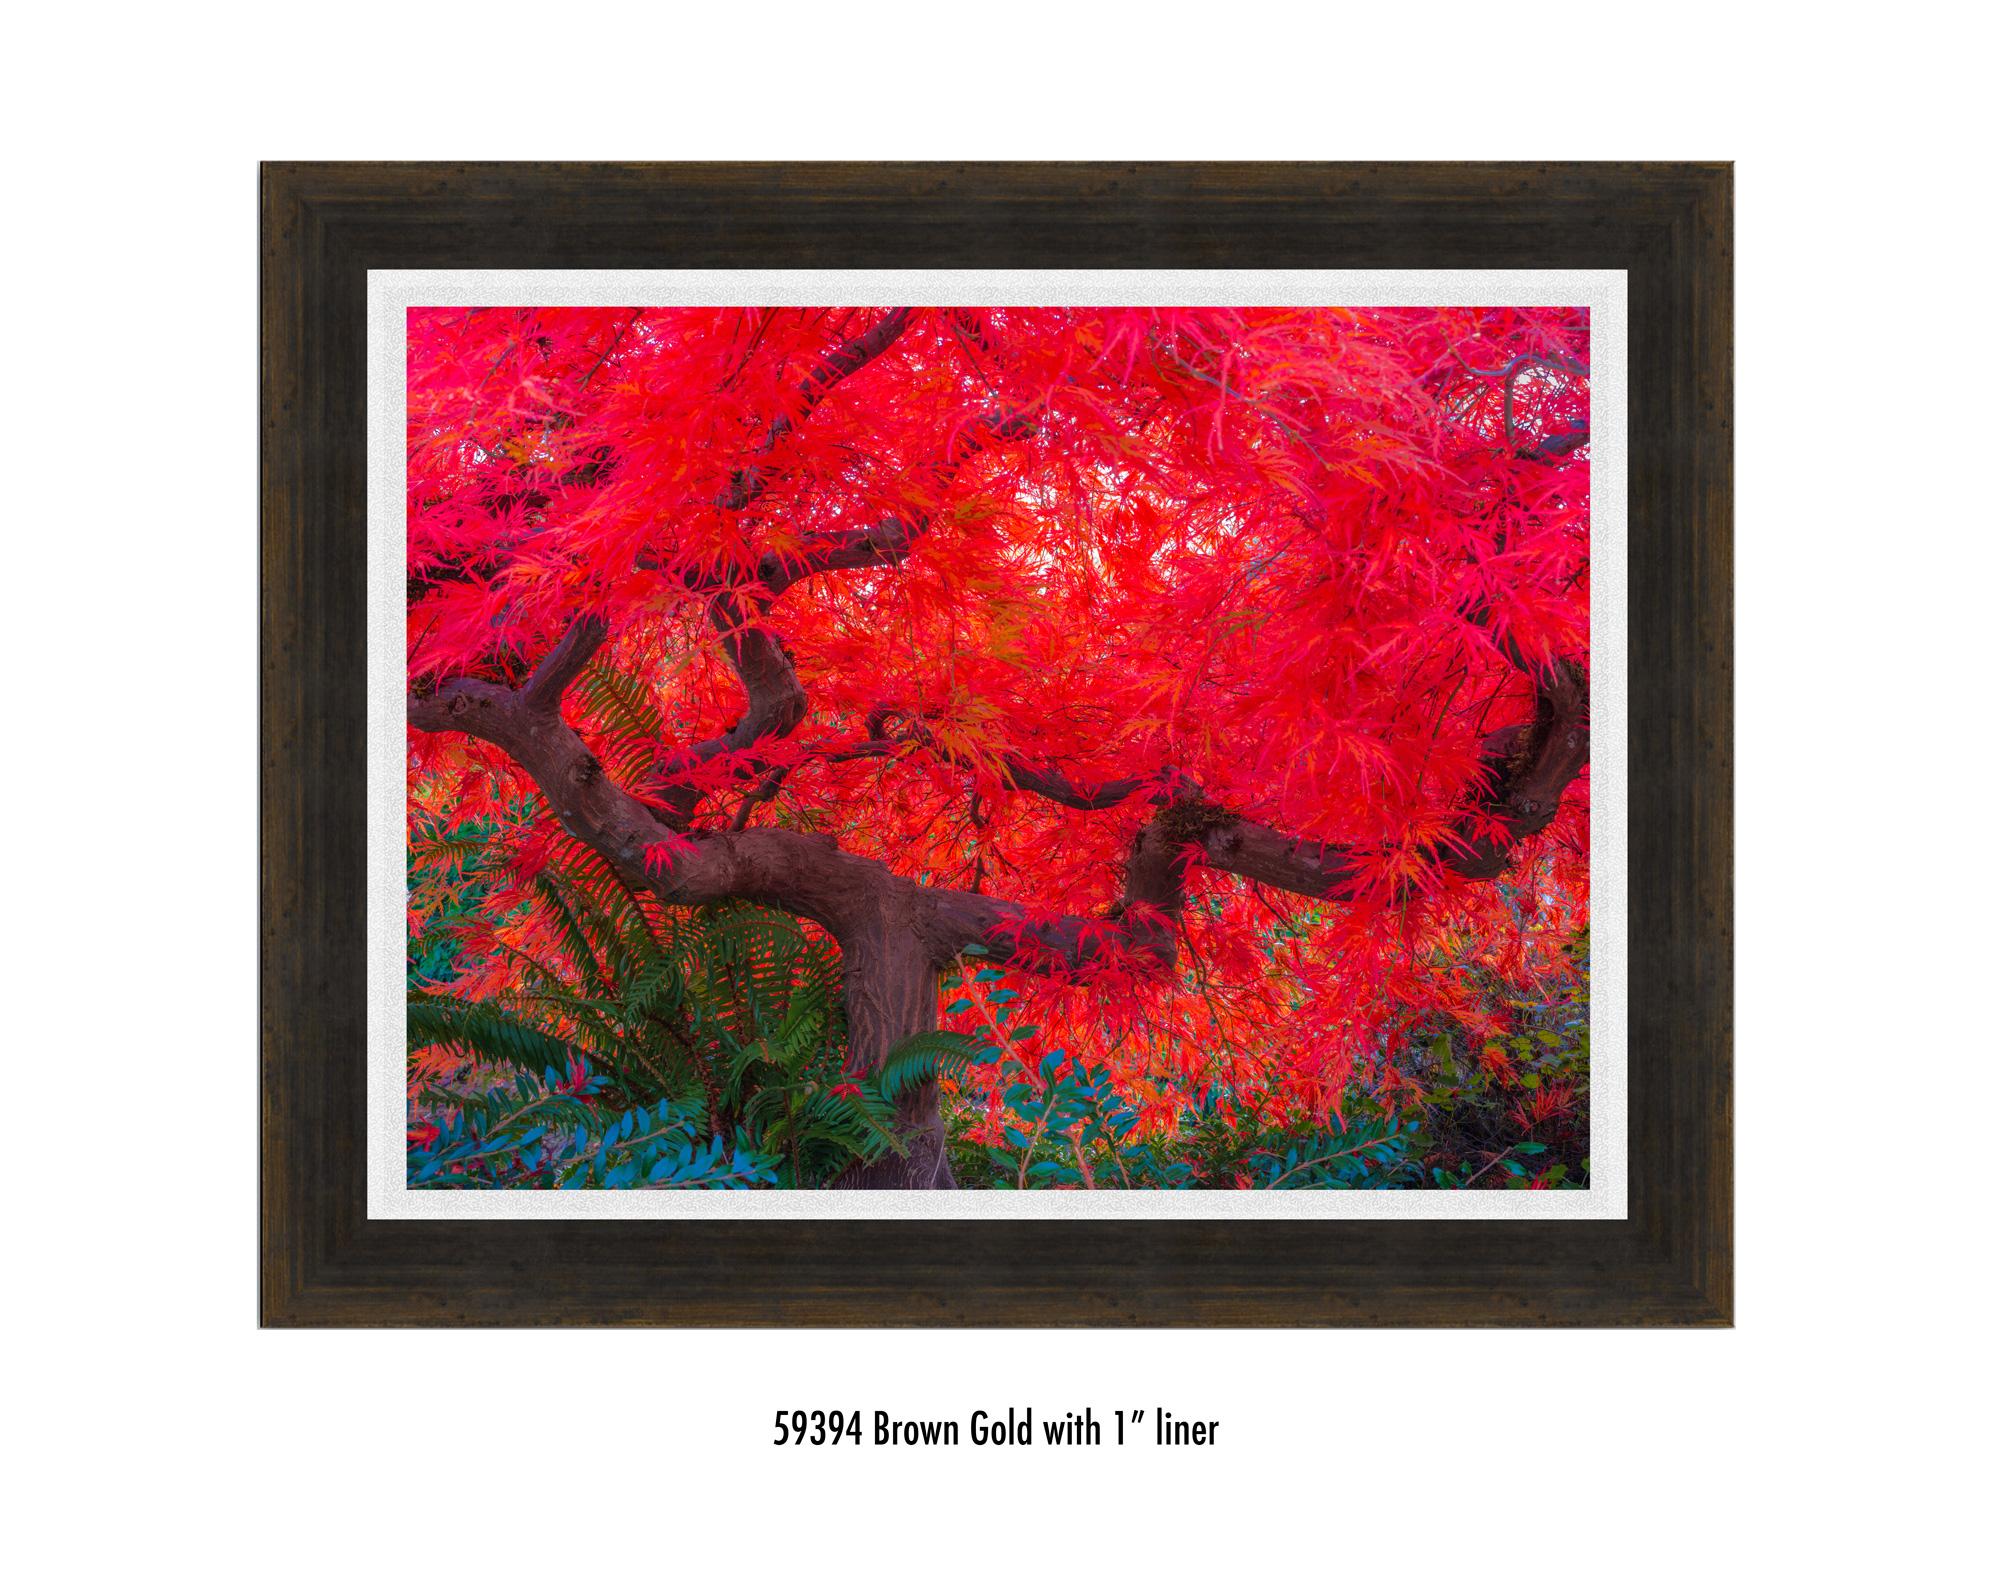 Scarlet-Tree-59394-1-wht.jpg